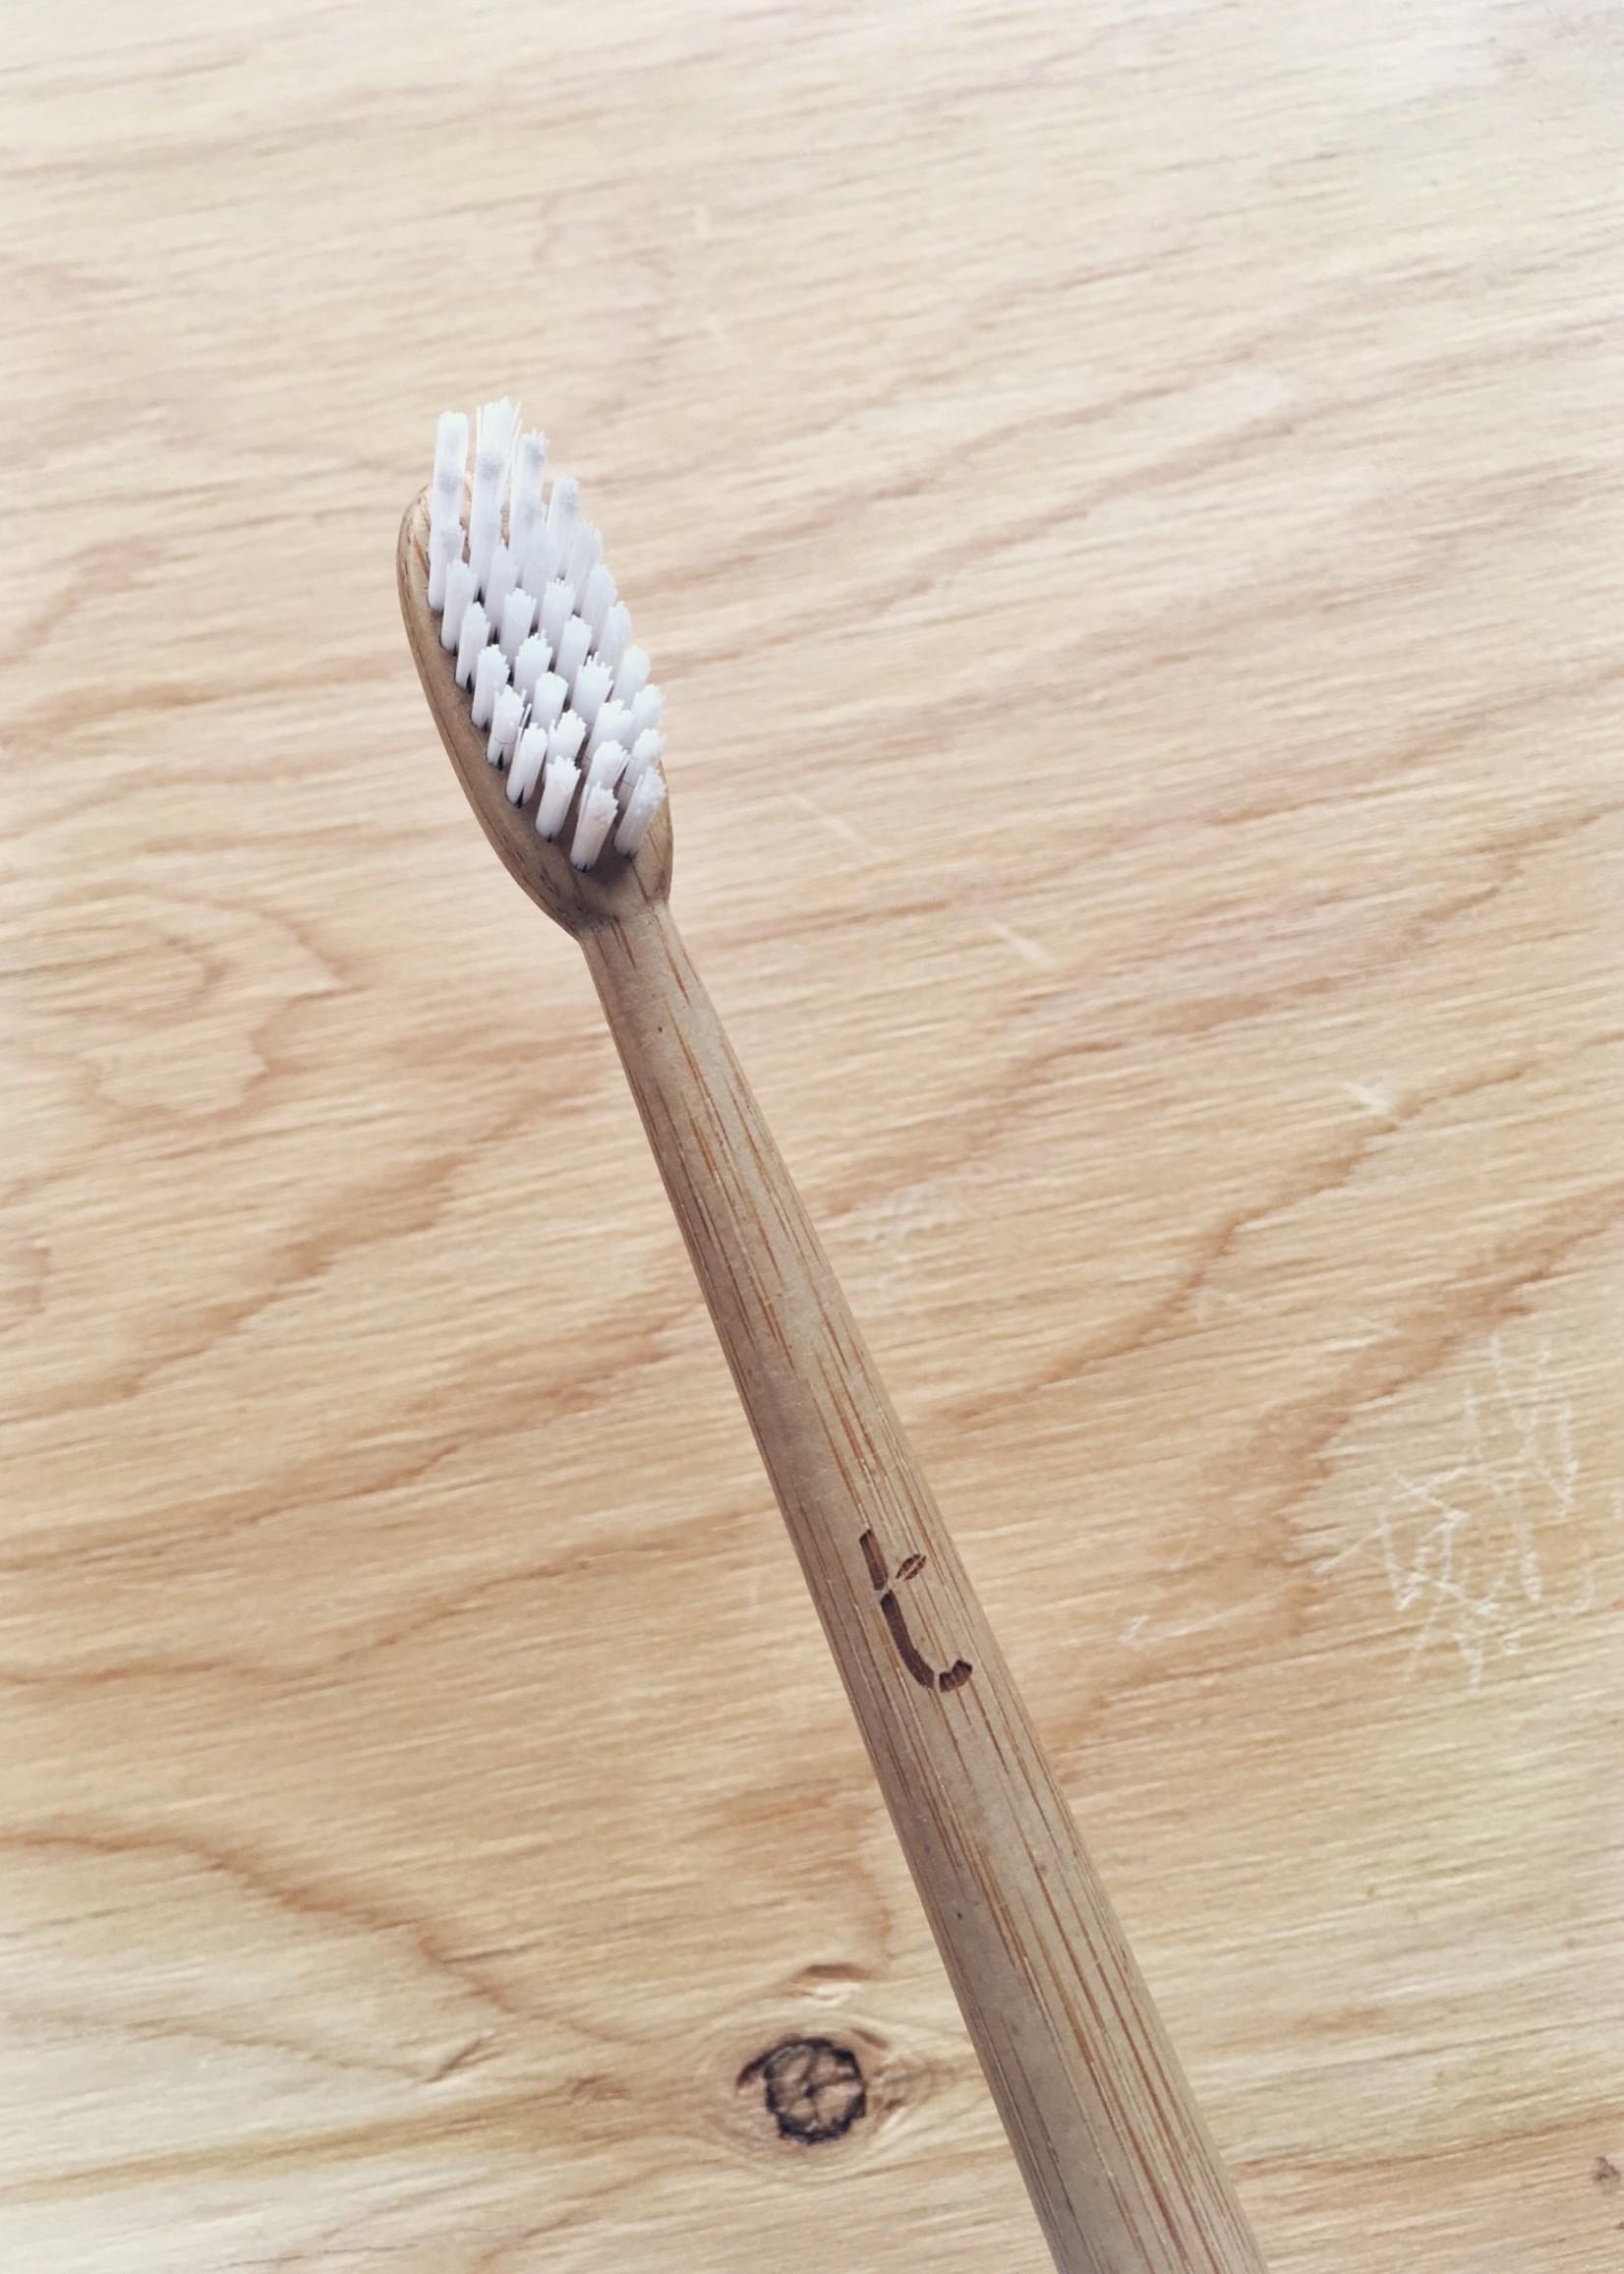 Truthbrush Bamboo Toothbrush - Soft Bristles